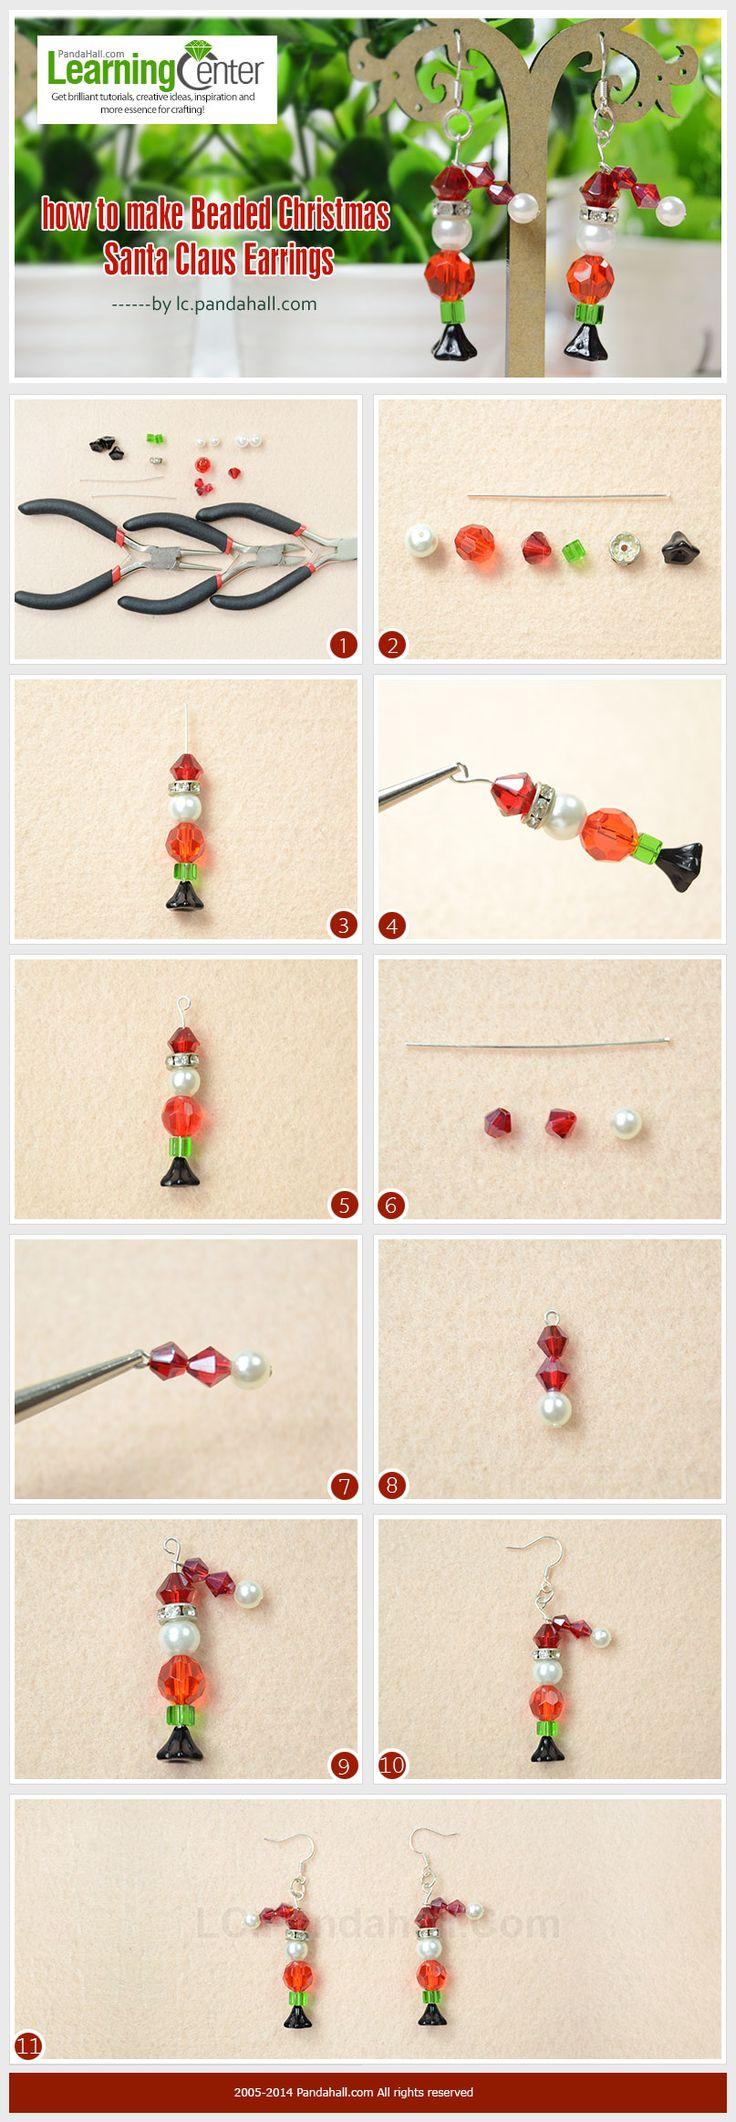 How to Make Beaded Christmas Santa Claus Earrings